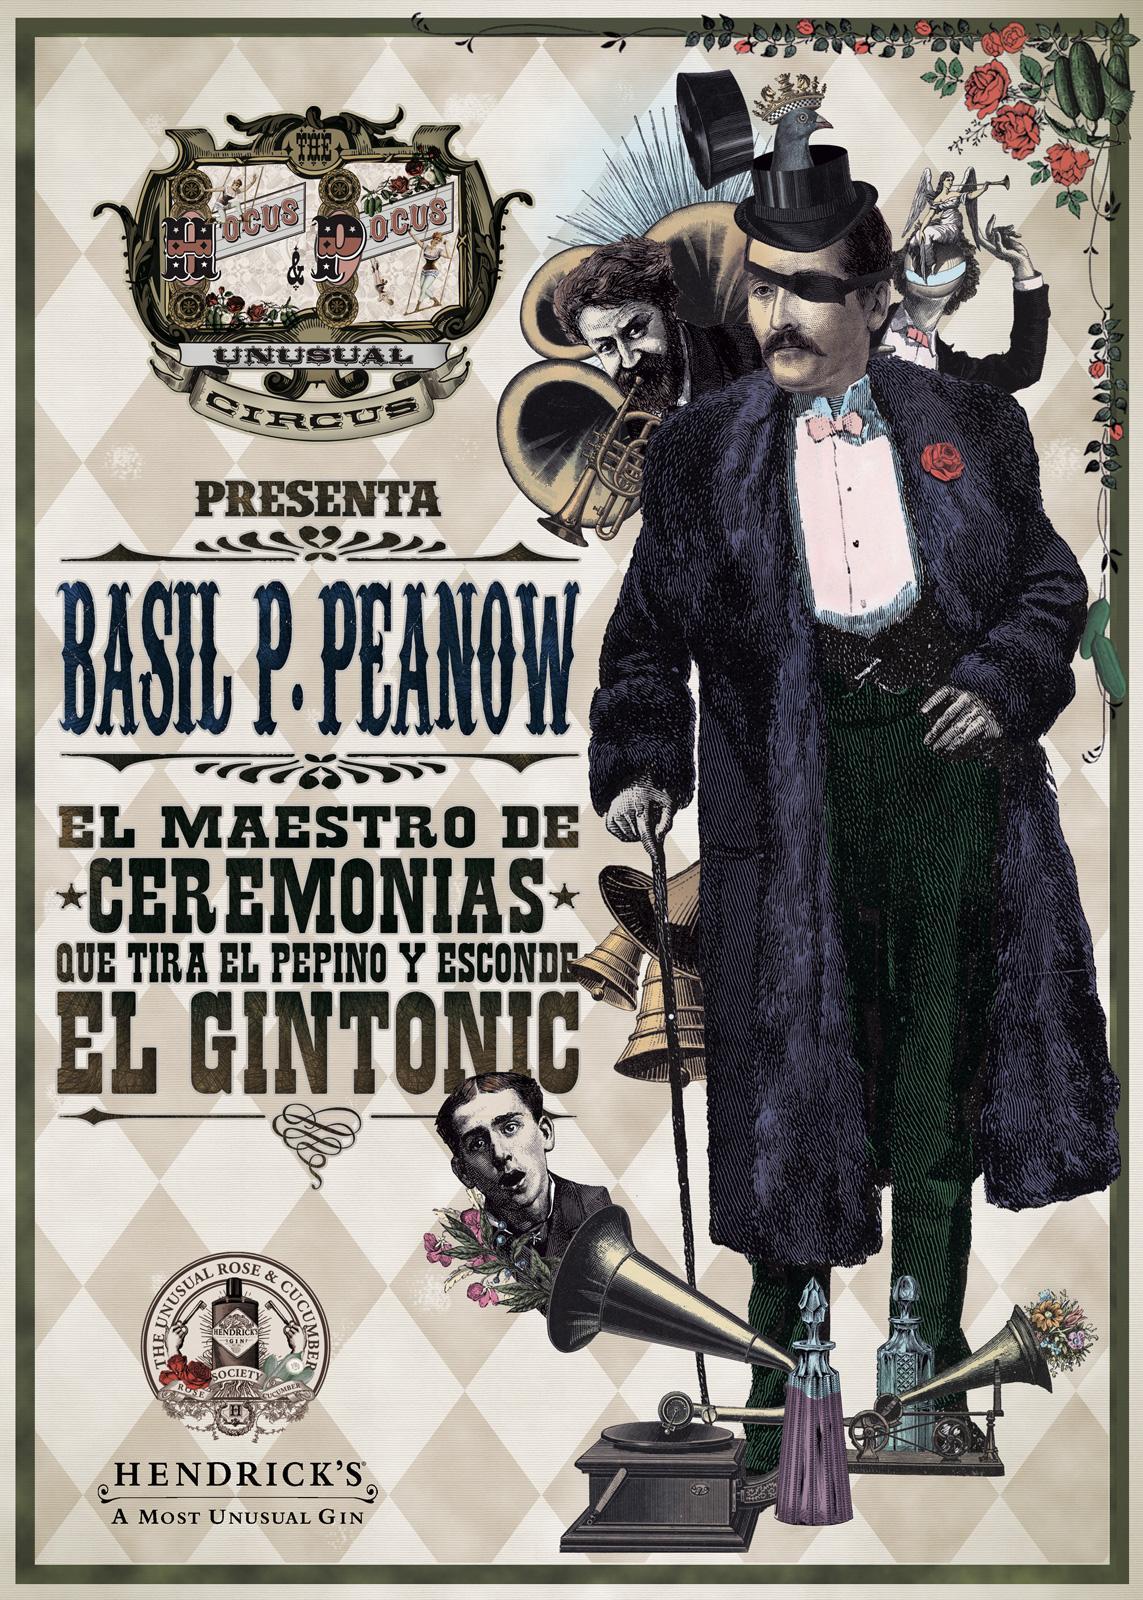 Hendrick's Gyn Print Ad -  Basil P. Peanow